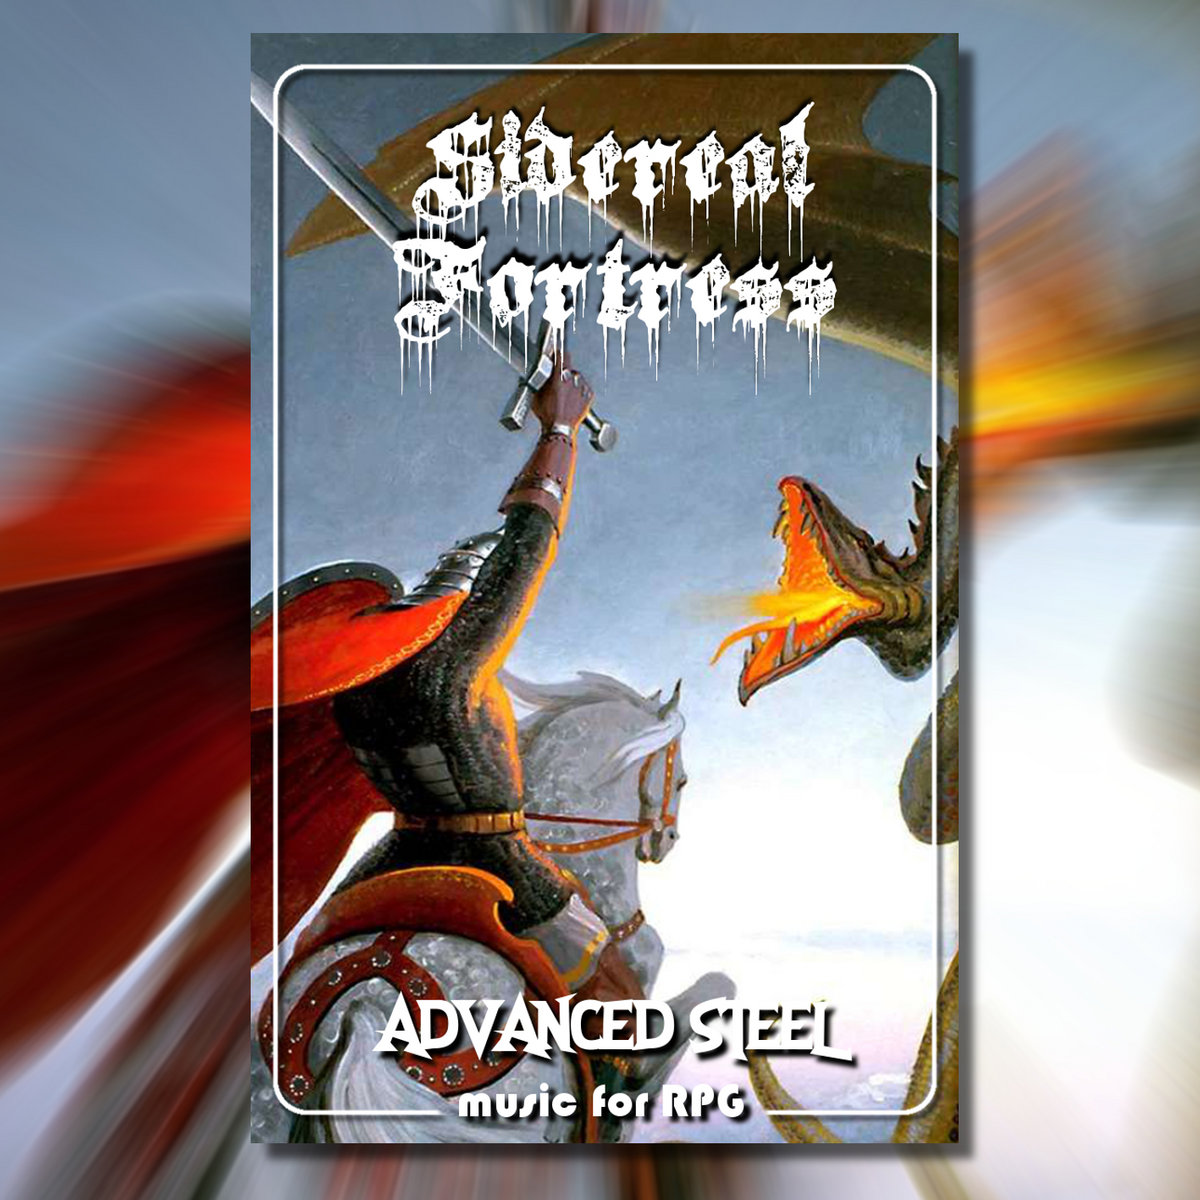 Advanced Steel - Music for RPG